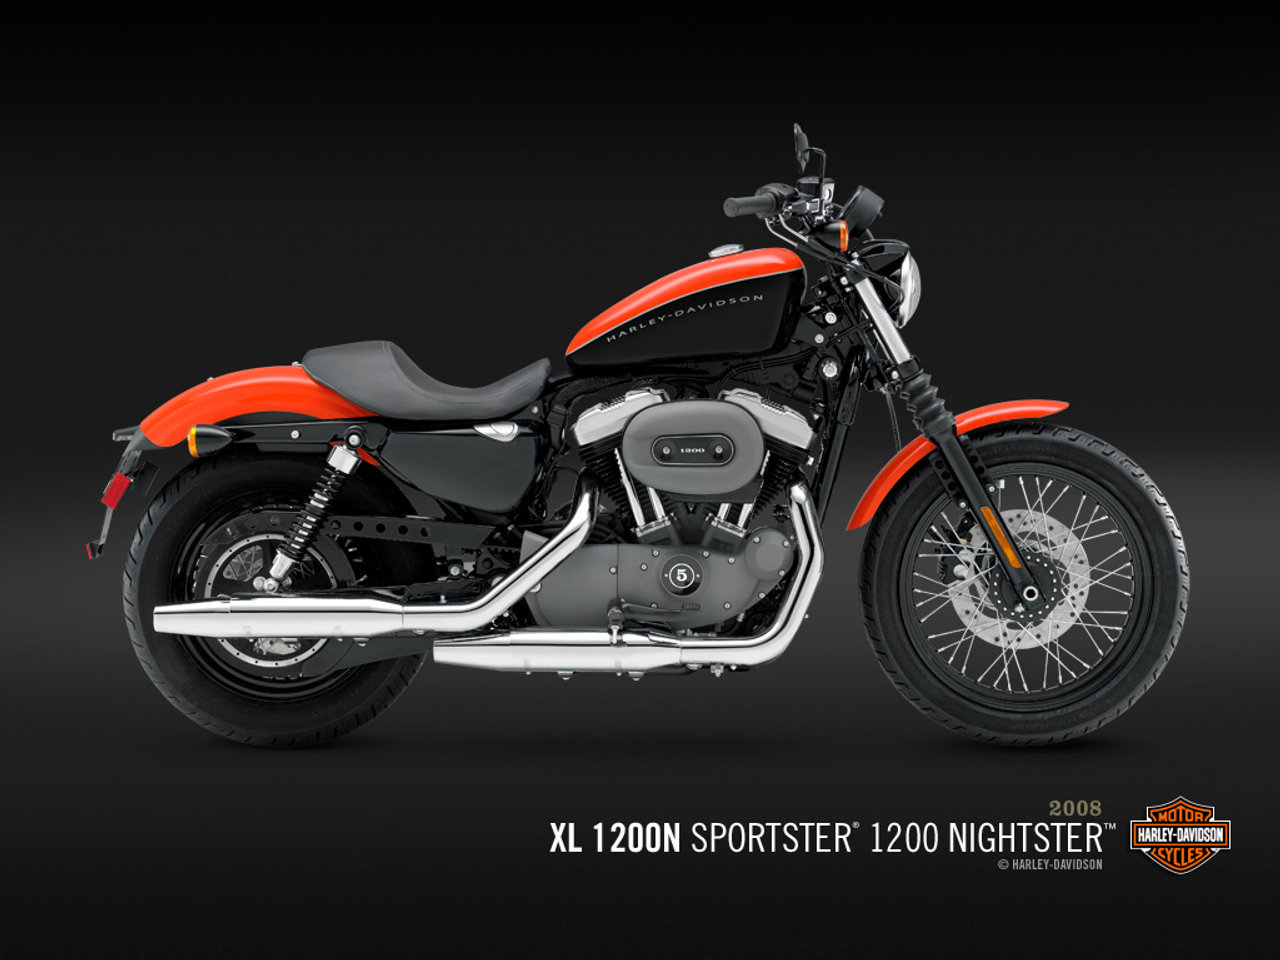 Harley Davidson Sportster Wallpaper 7116 Hd Wallpapers in Bikes 1280x960